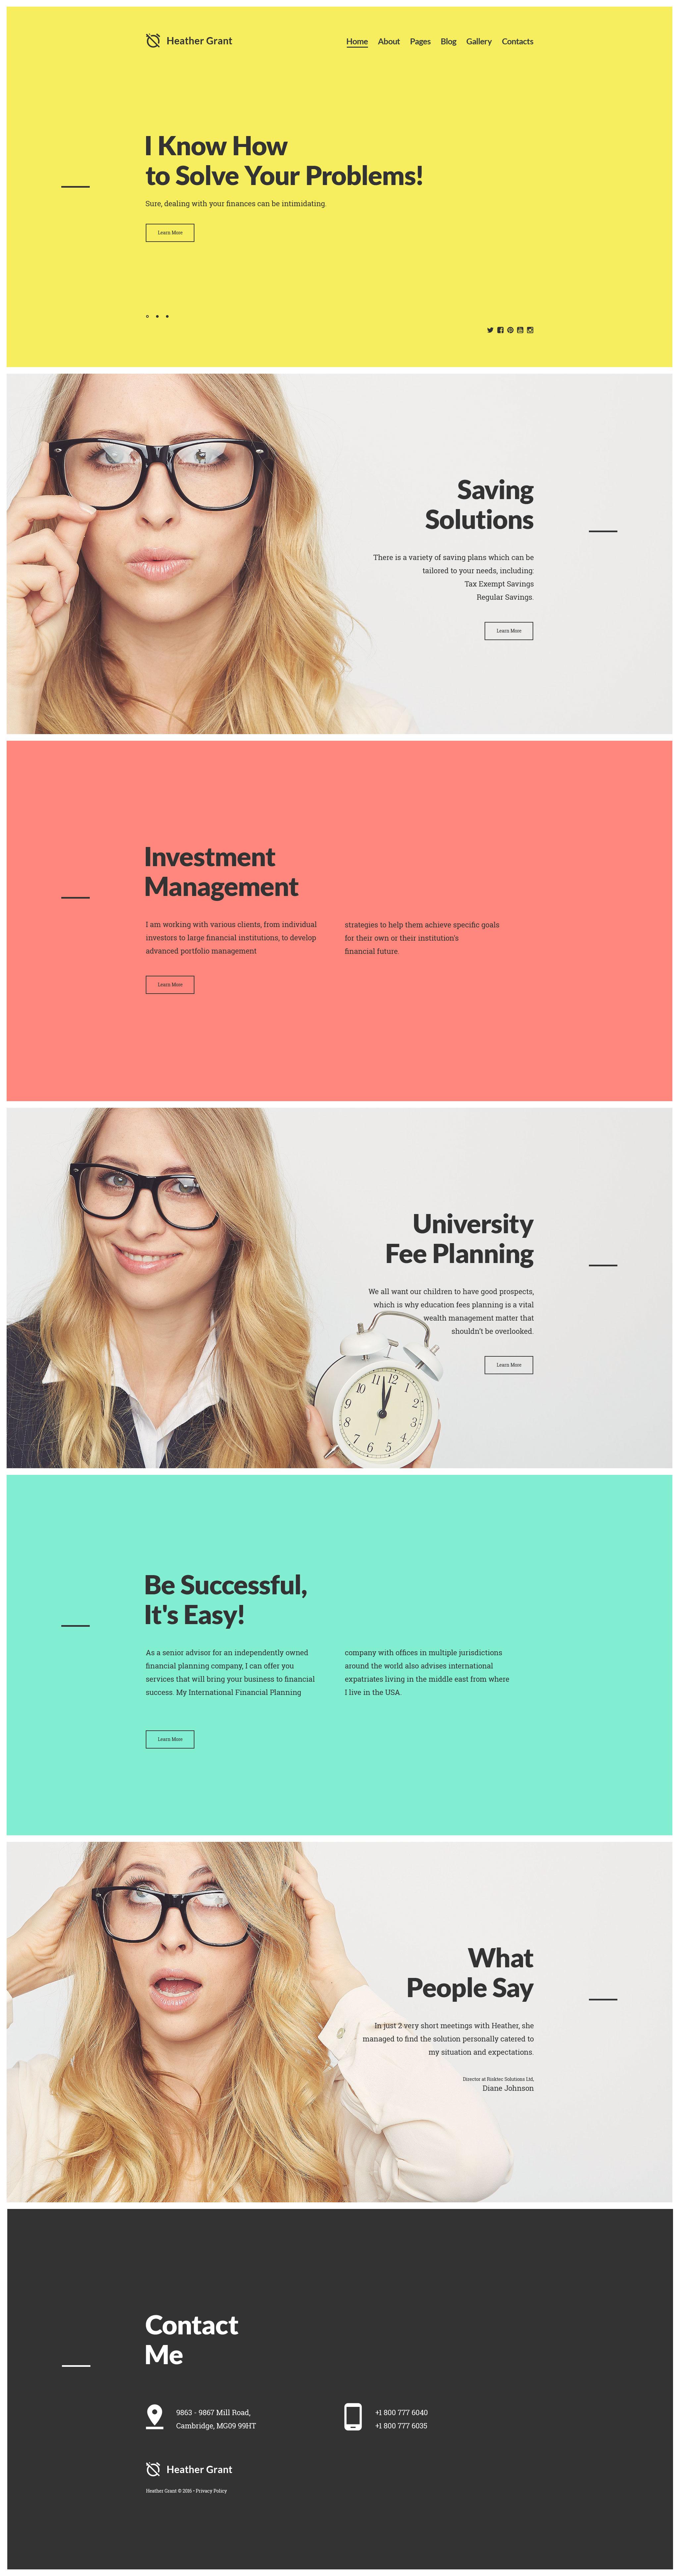 Heather Grant - Financial Advisor Joomla Template - screenshot